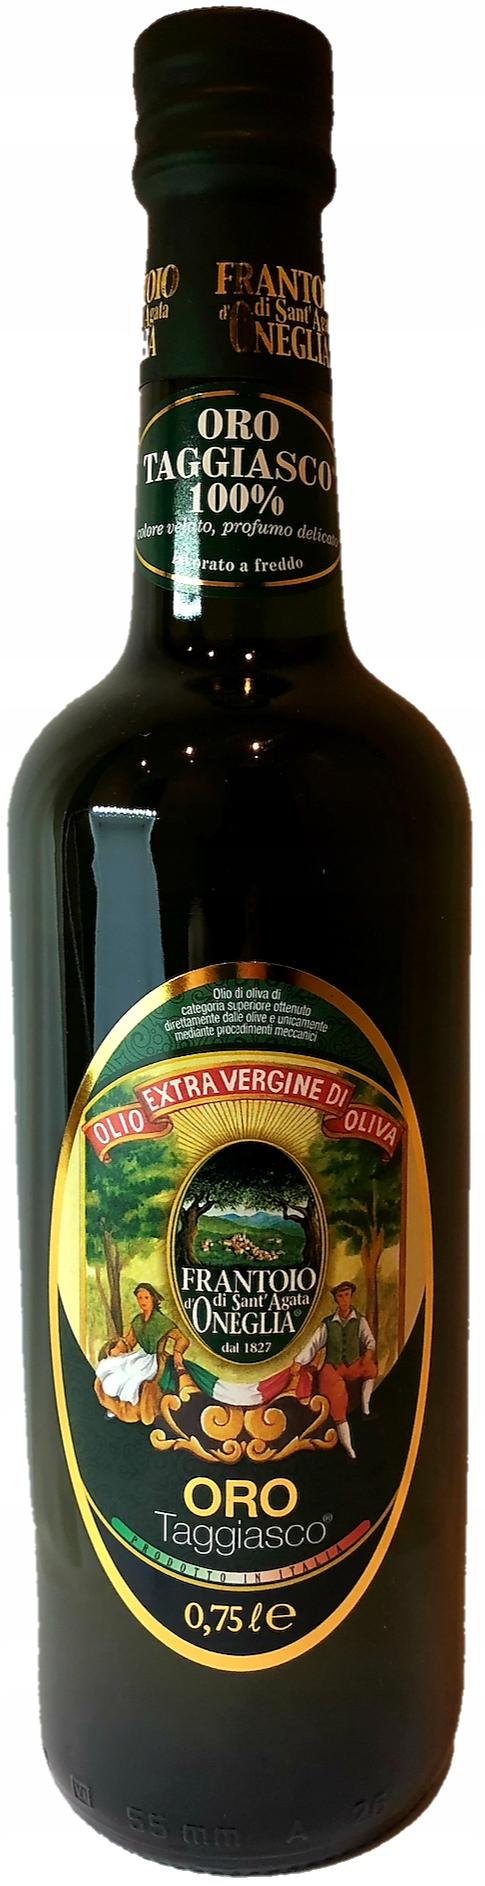 "Olivový olej ""Extra Virgin"" ORO Taggiasco 0.75 l"